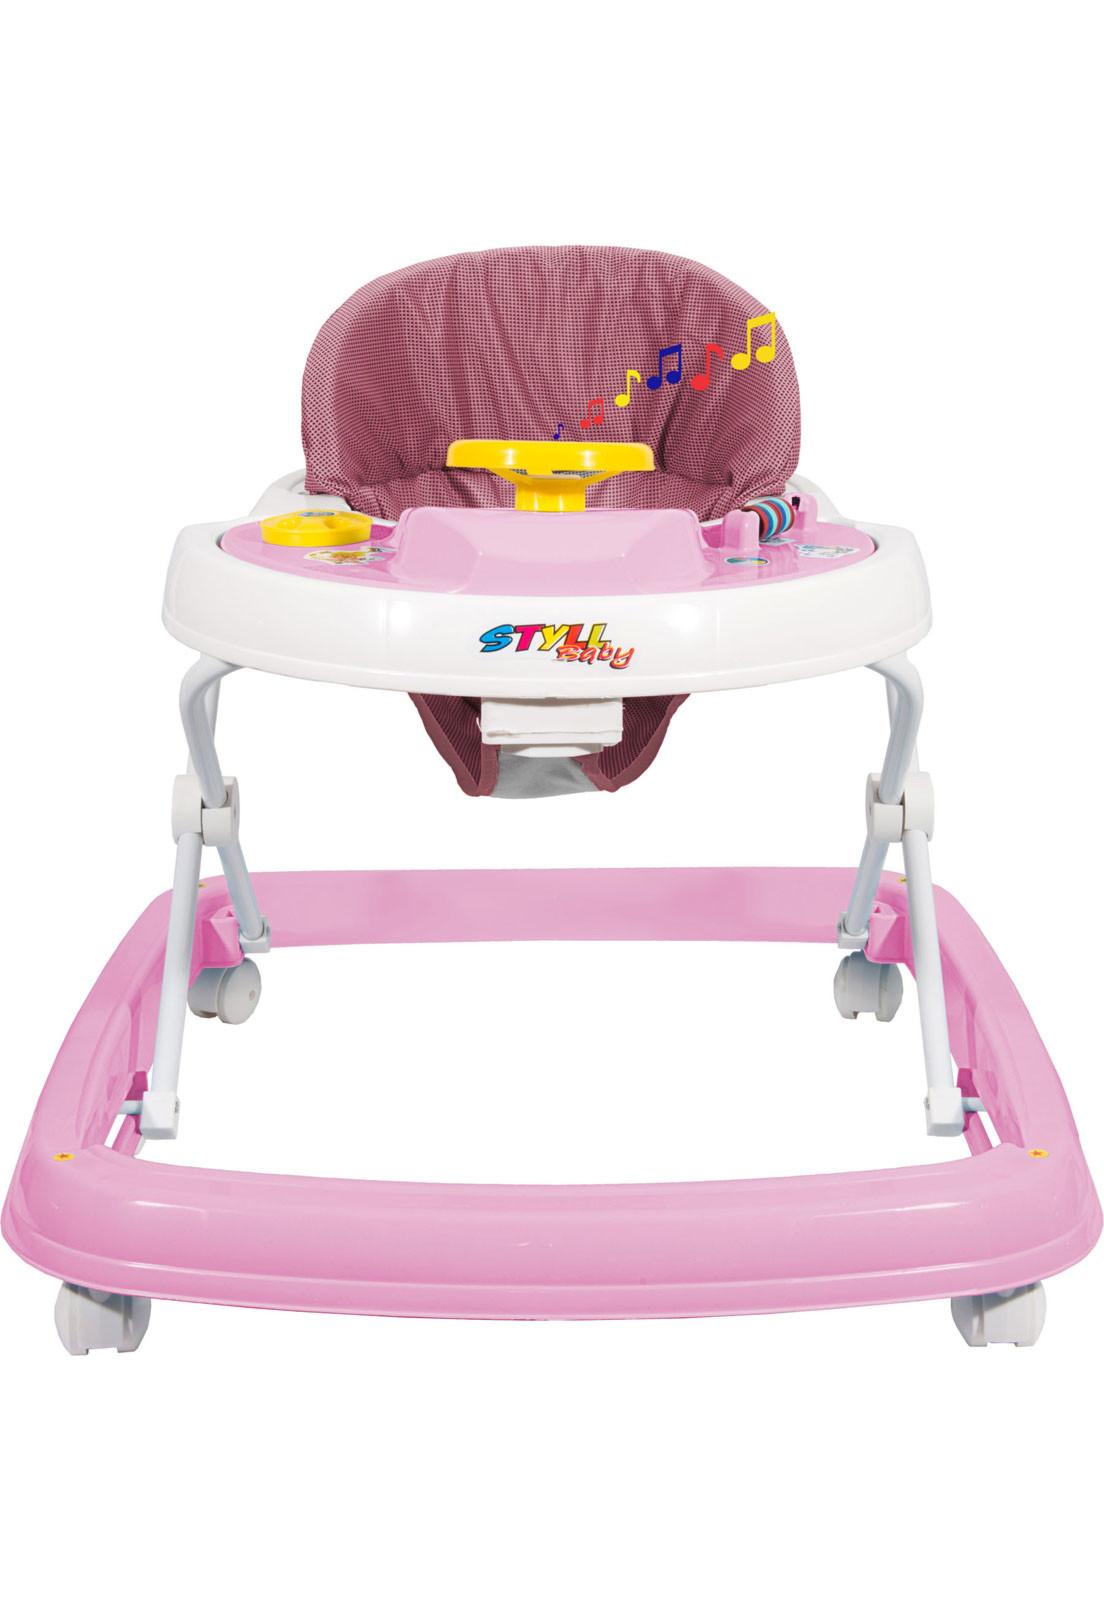 Andador Styll Baby Rosa Sonoro - StyllBaby